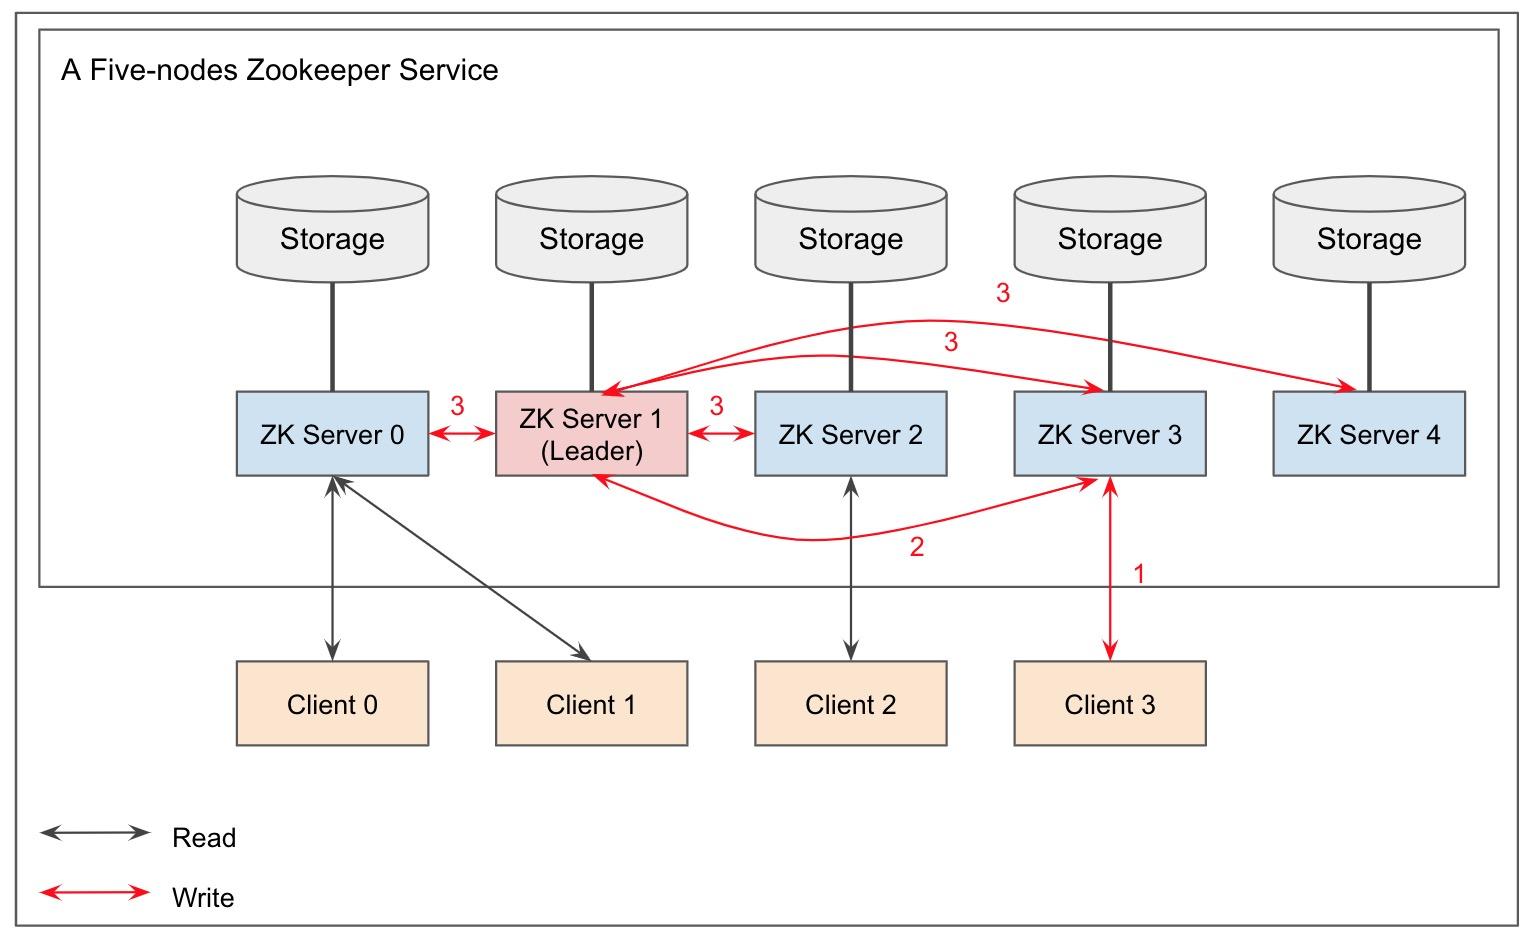 A five-nodes Zookeeper Service